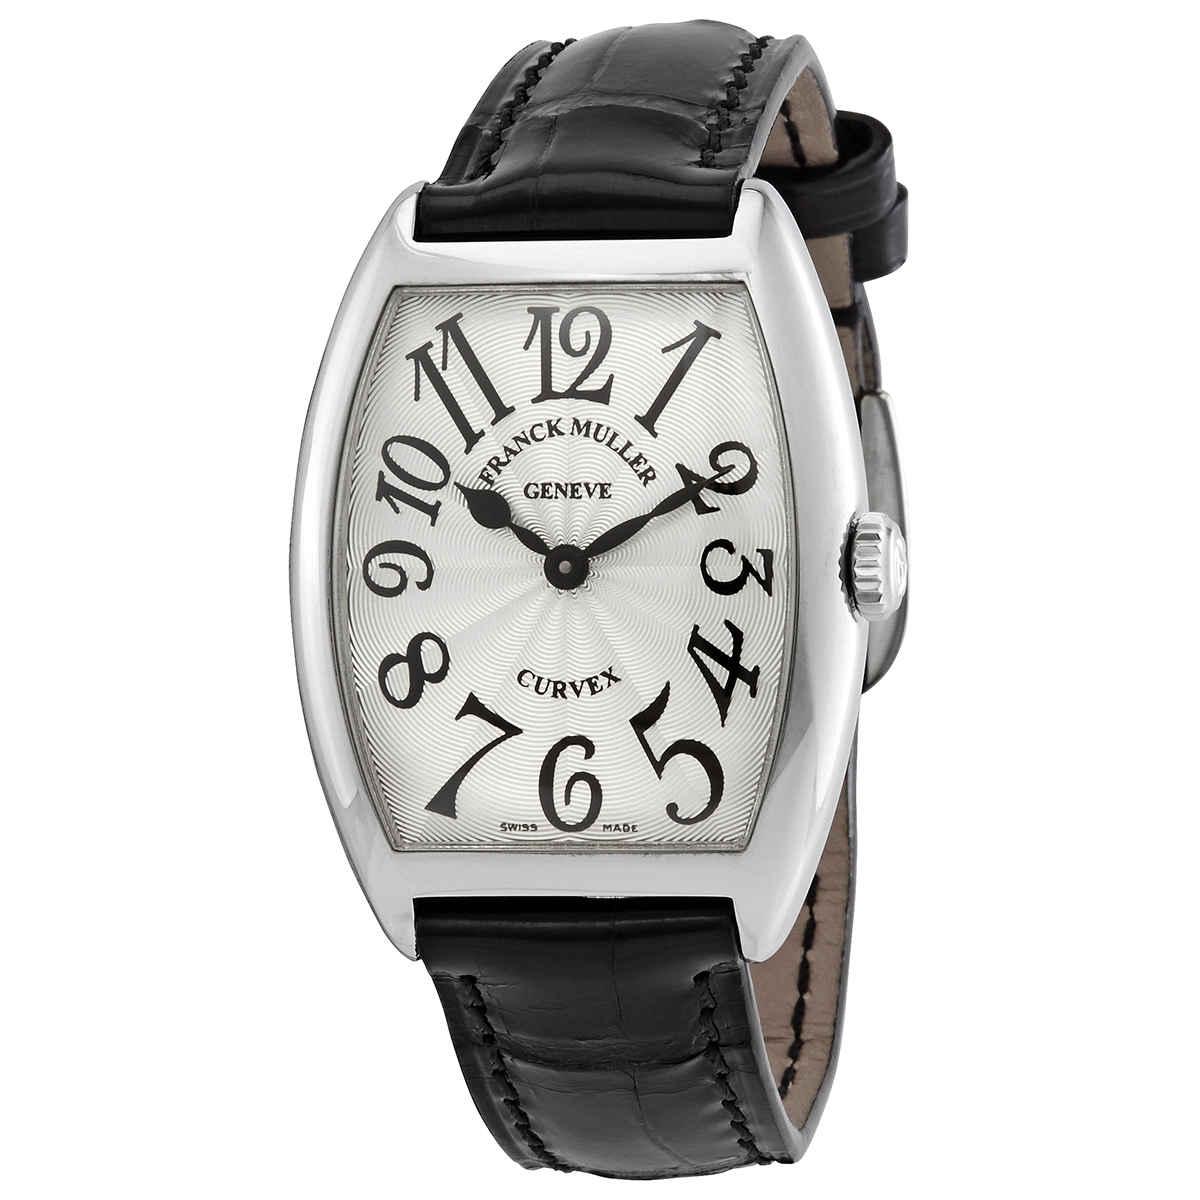 Franck Muller Cintree Curvex Quartz Silver Dial Unisex Watch 7502 Qz (ac) In Black,silver Tone